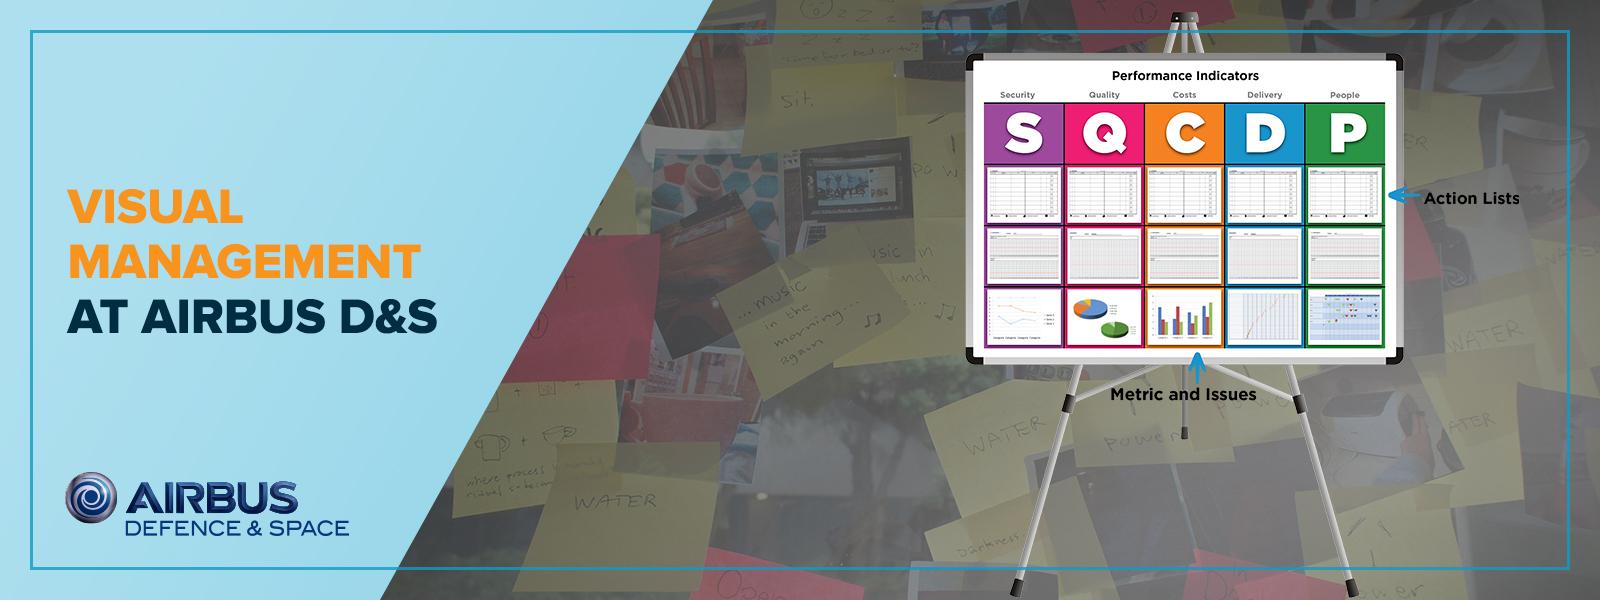 LAA-Blog---1.1.3-AIRBUS-Visual-Management